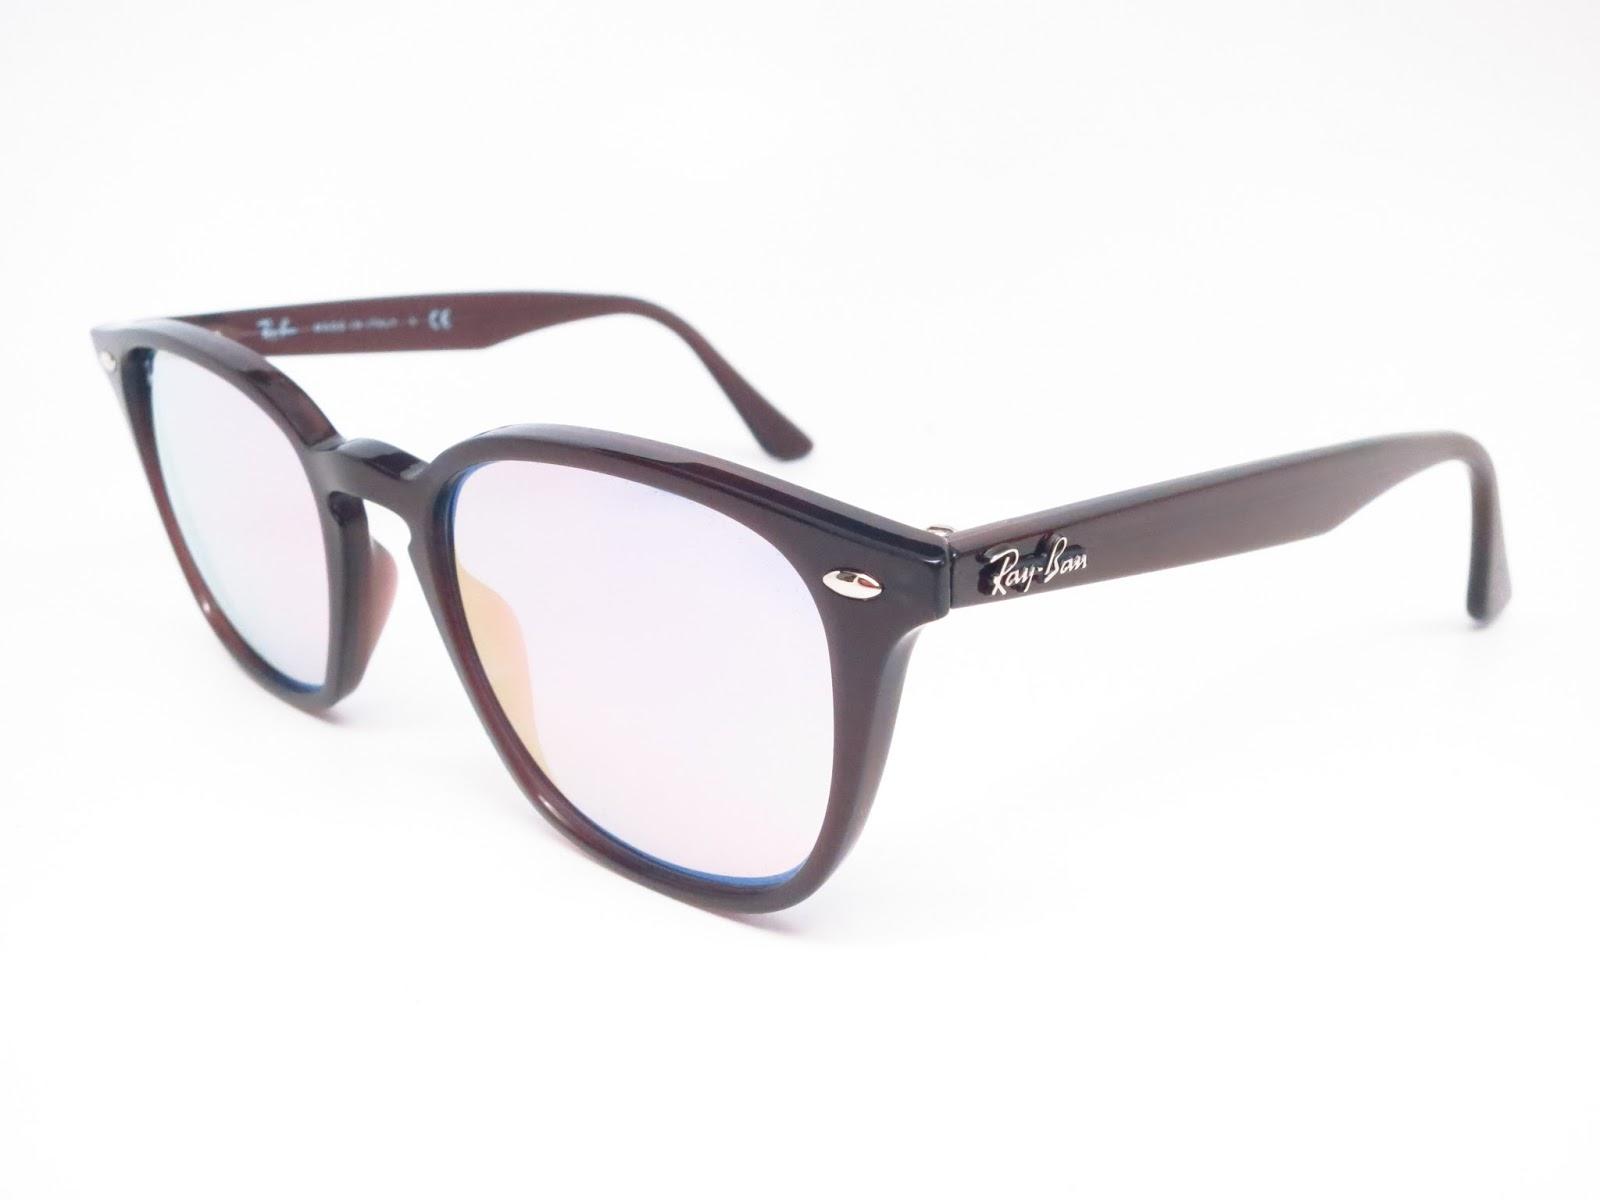 ray ban 4258  rb 4258 6231/1n sunglasses